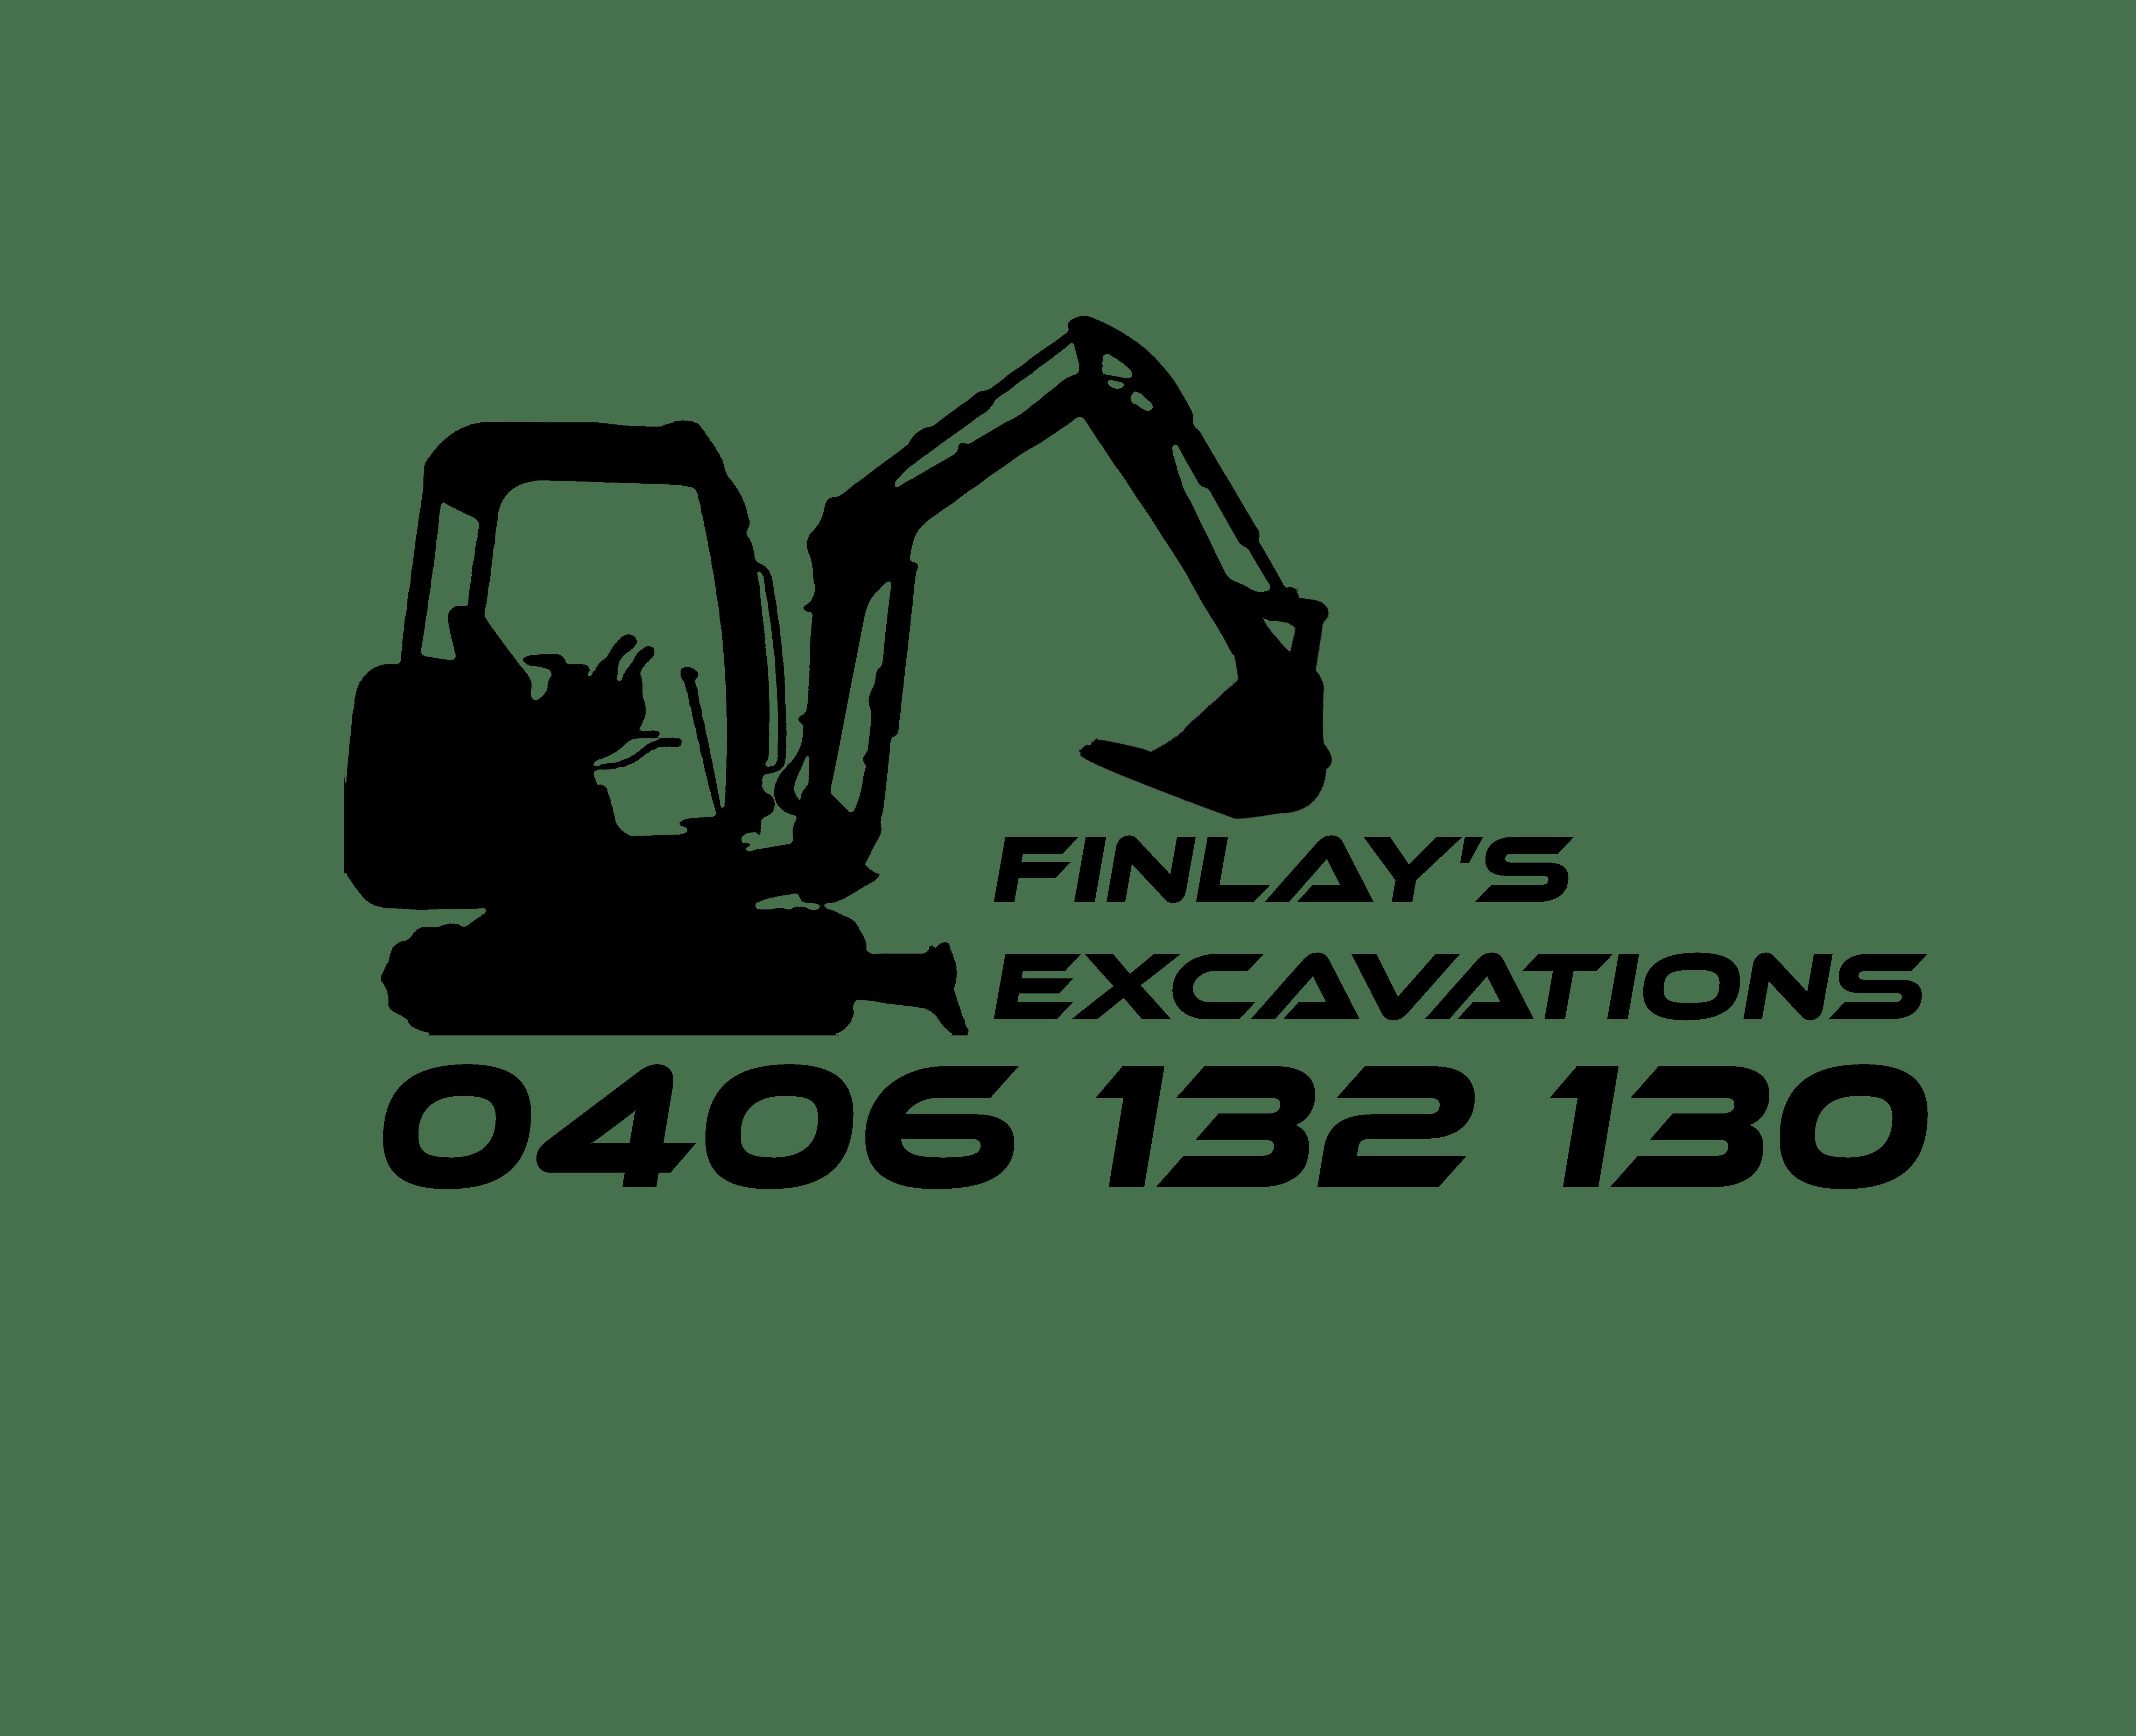 Finlay's Excavations